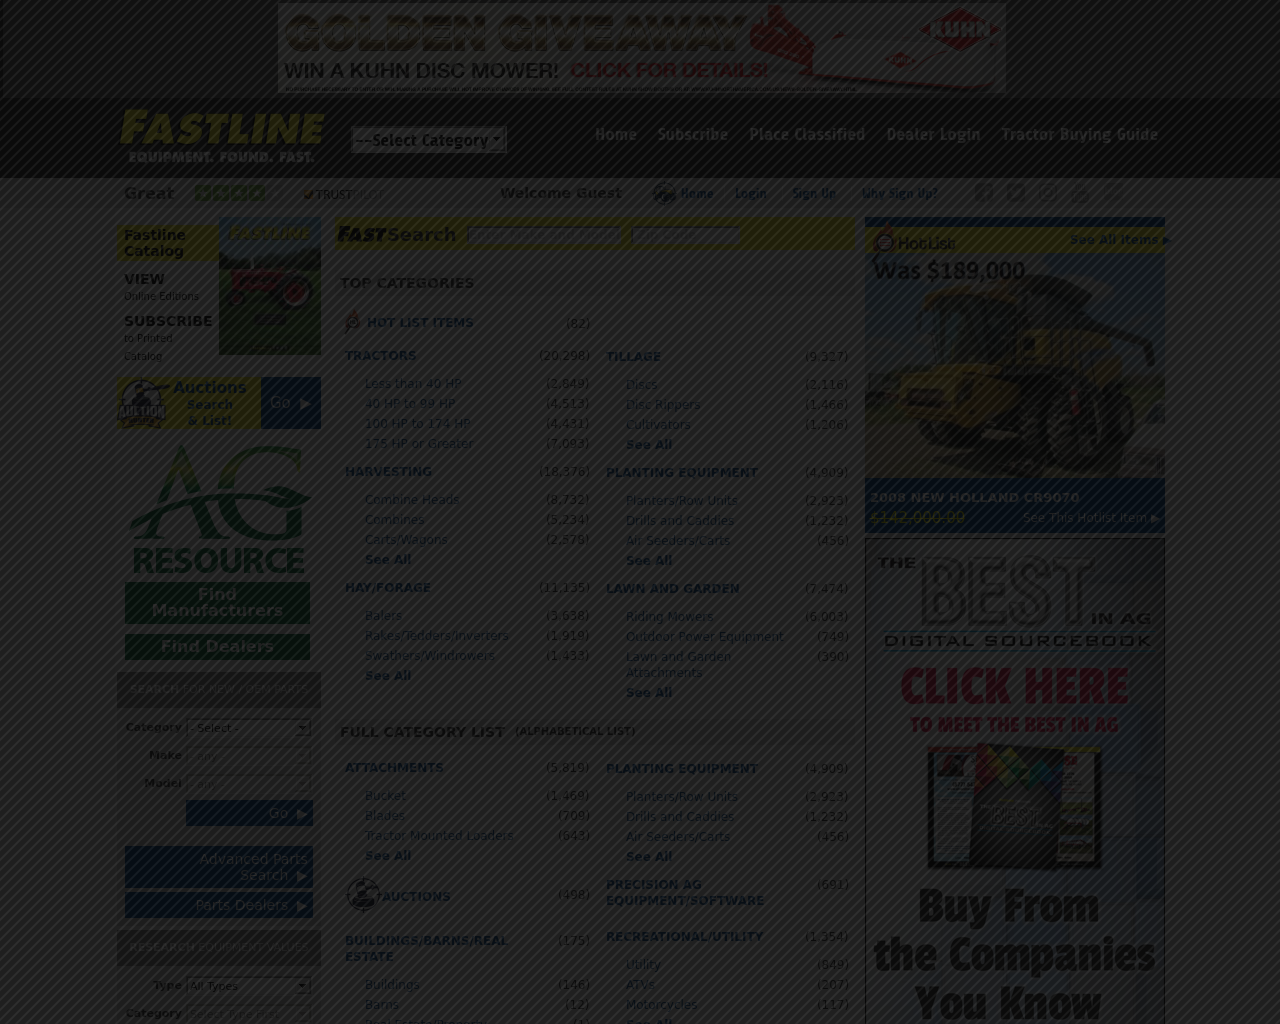 Fastline-Advertising-Reviews-Pricing